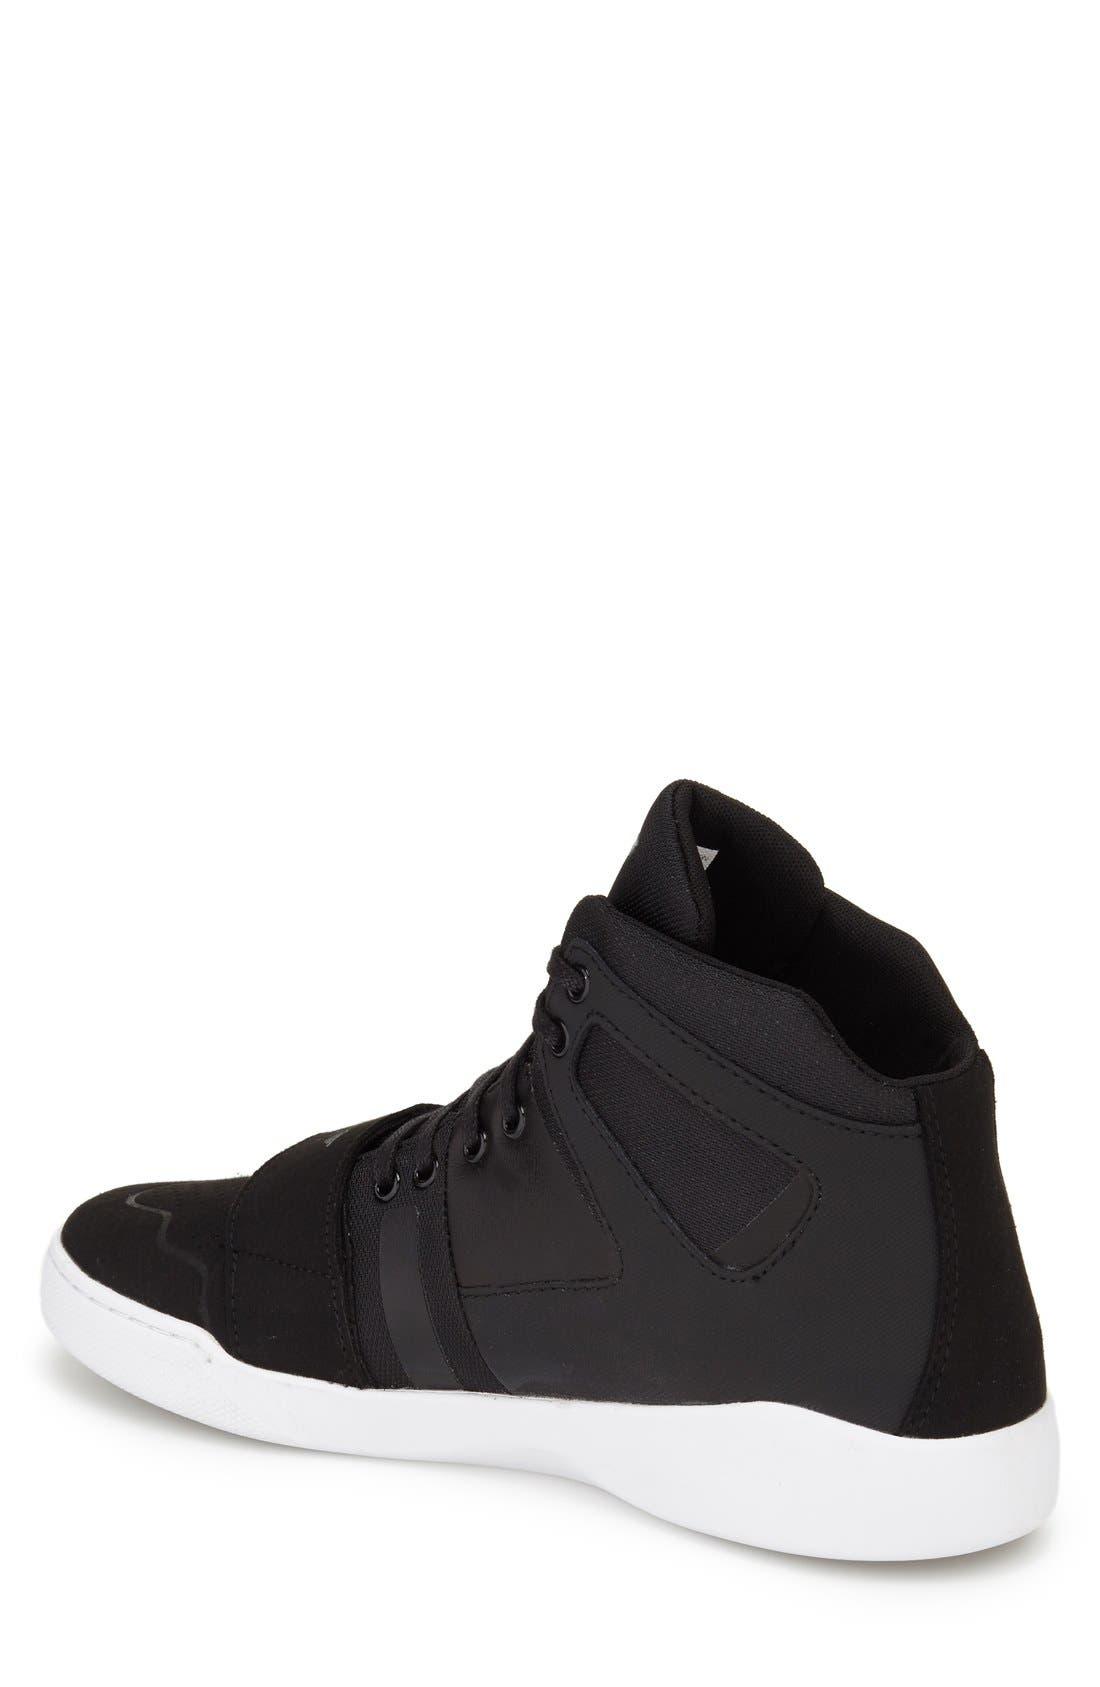 'Manzo' Sneaker,                             Alternate thumbnail 2, color,                             005